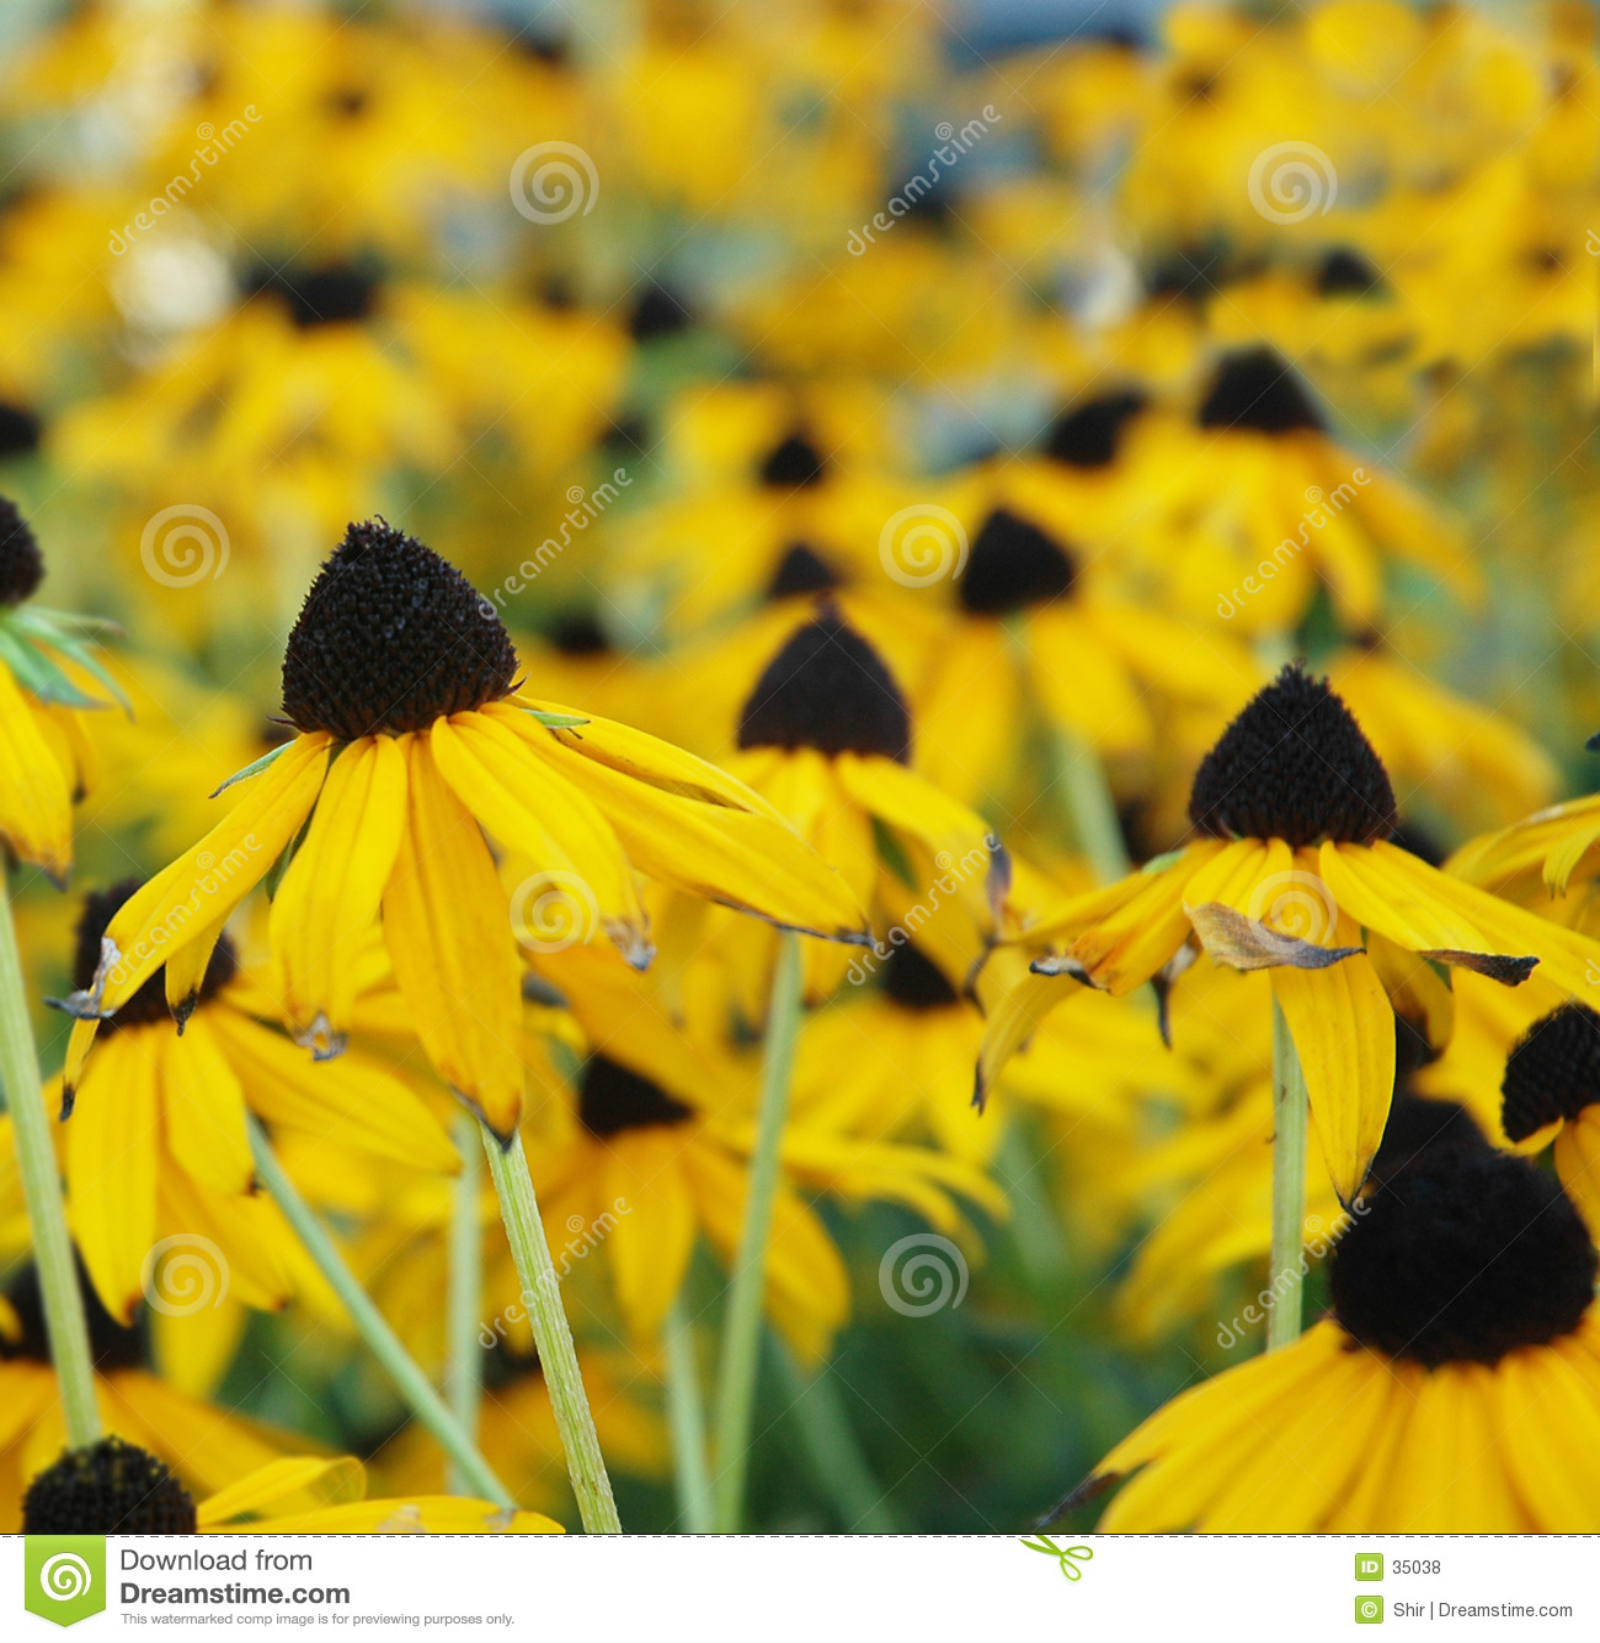 Black-Eyed Susan field